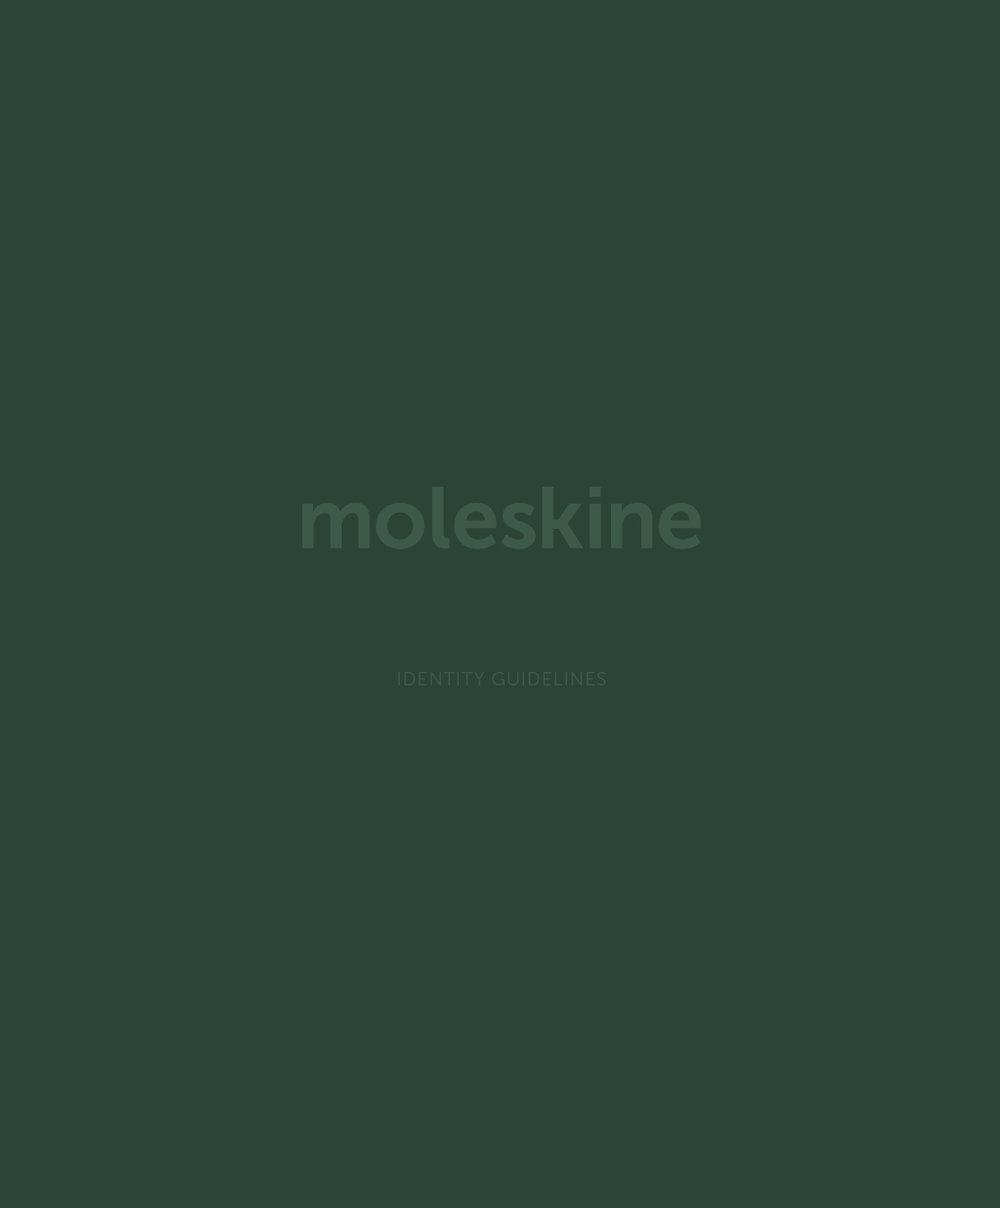 moleskine-brandbook-cover.jpg